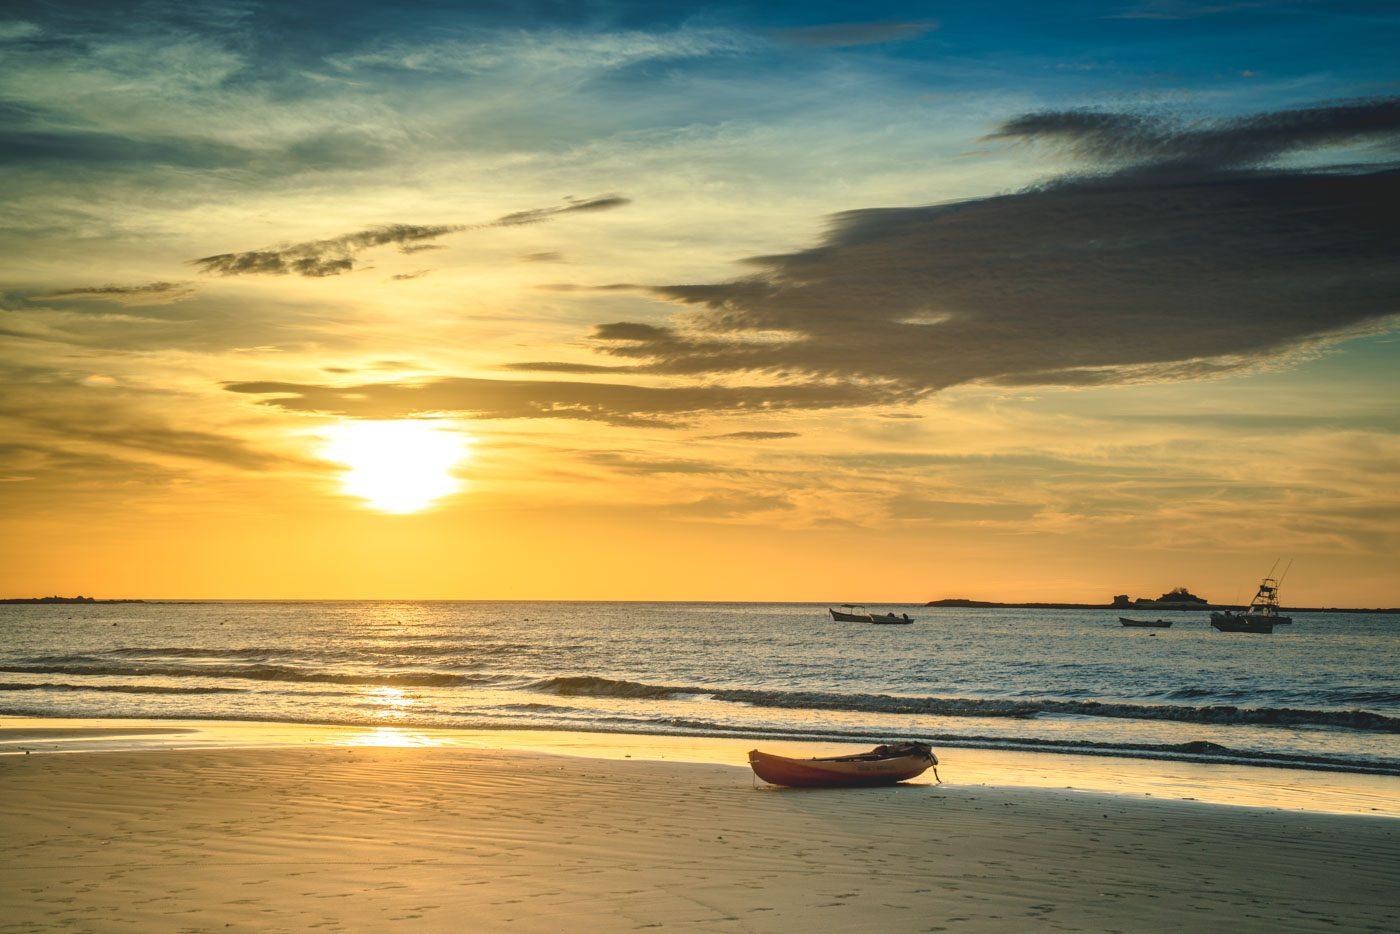 Some of the best beaches in Guanacaste includeTamarindo Costa Rica